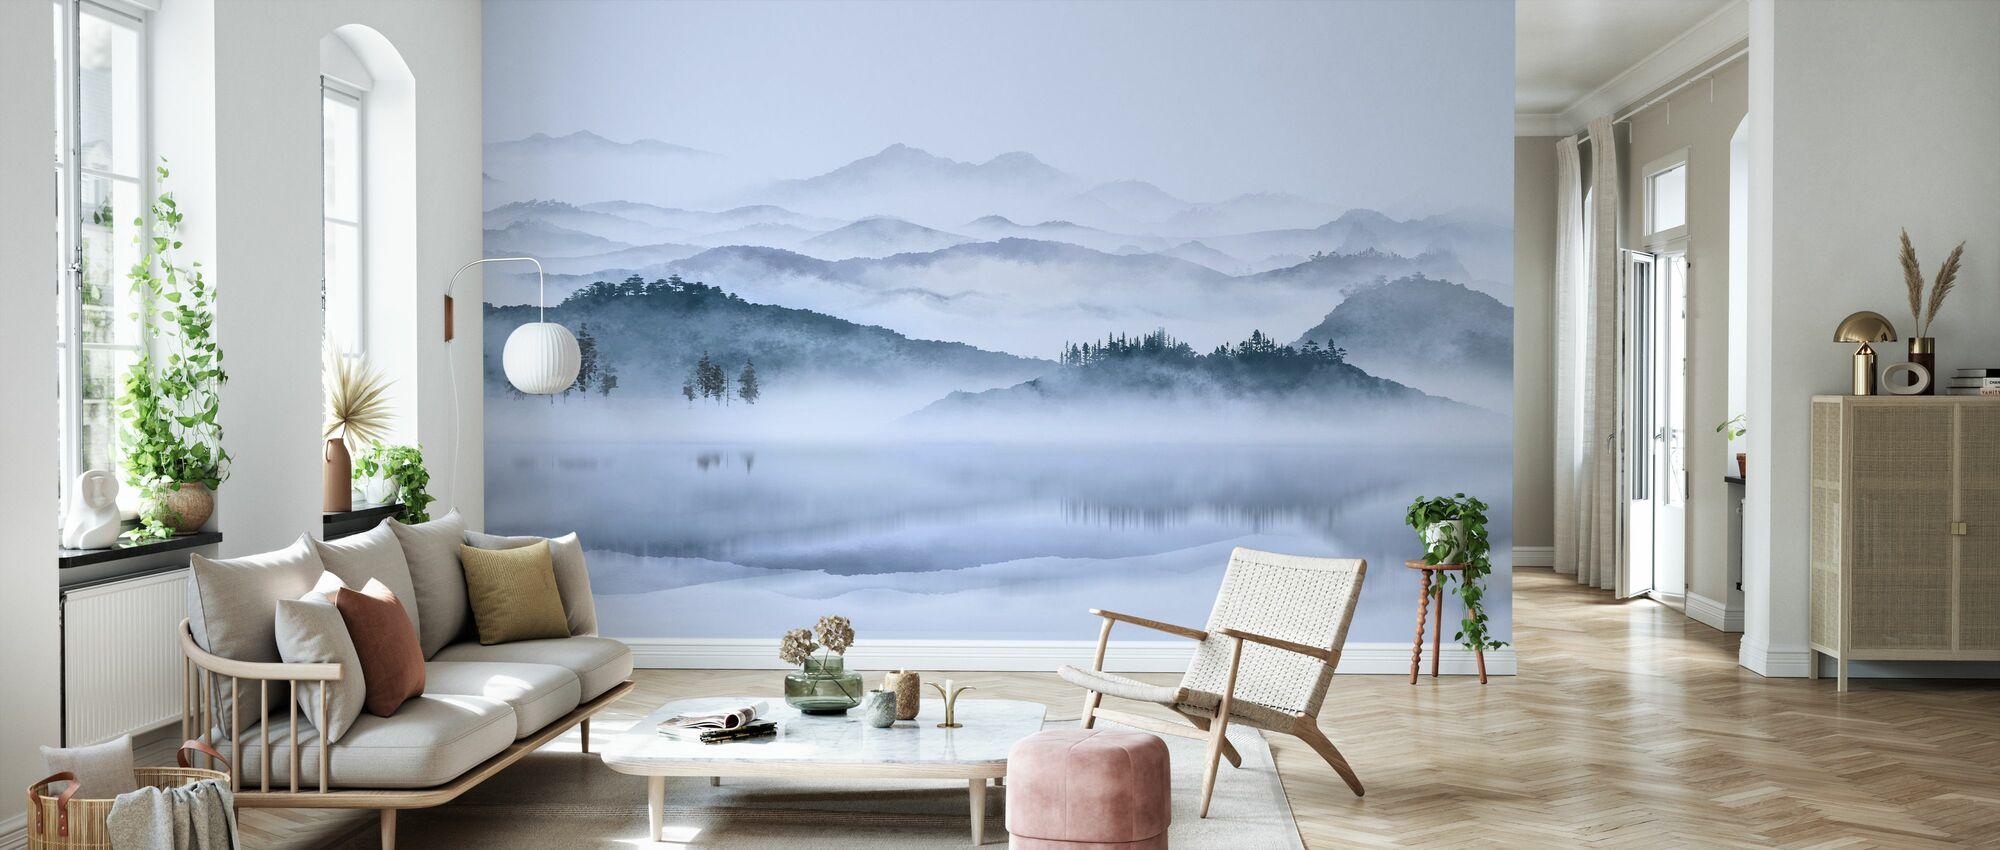 Misty Scenery - Wallpaper - Living Room